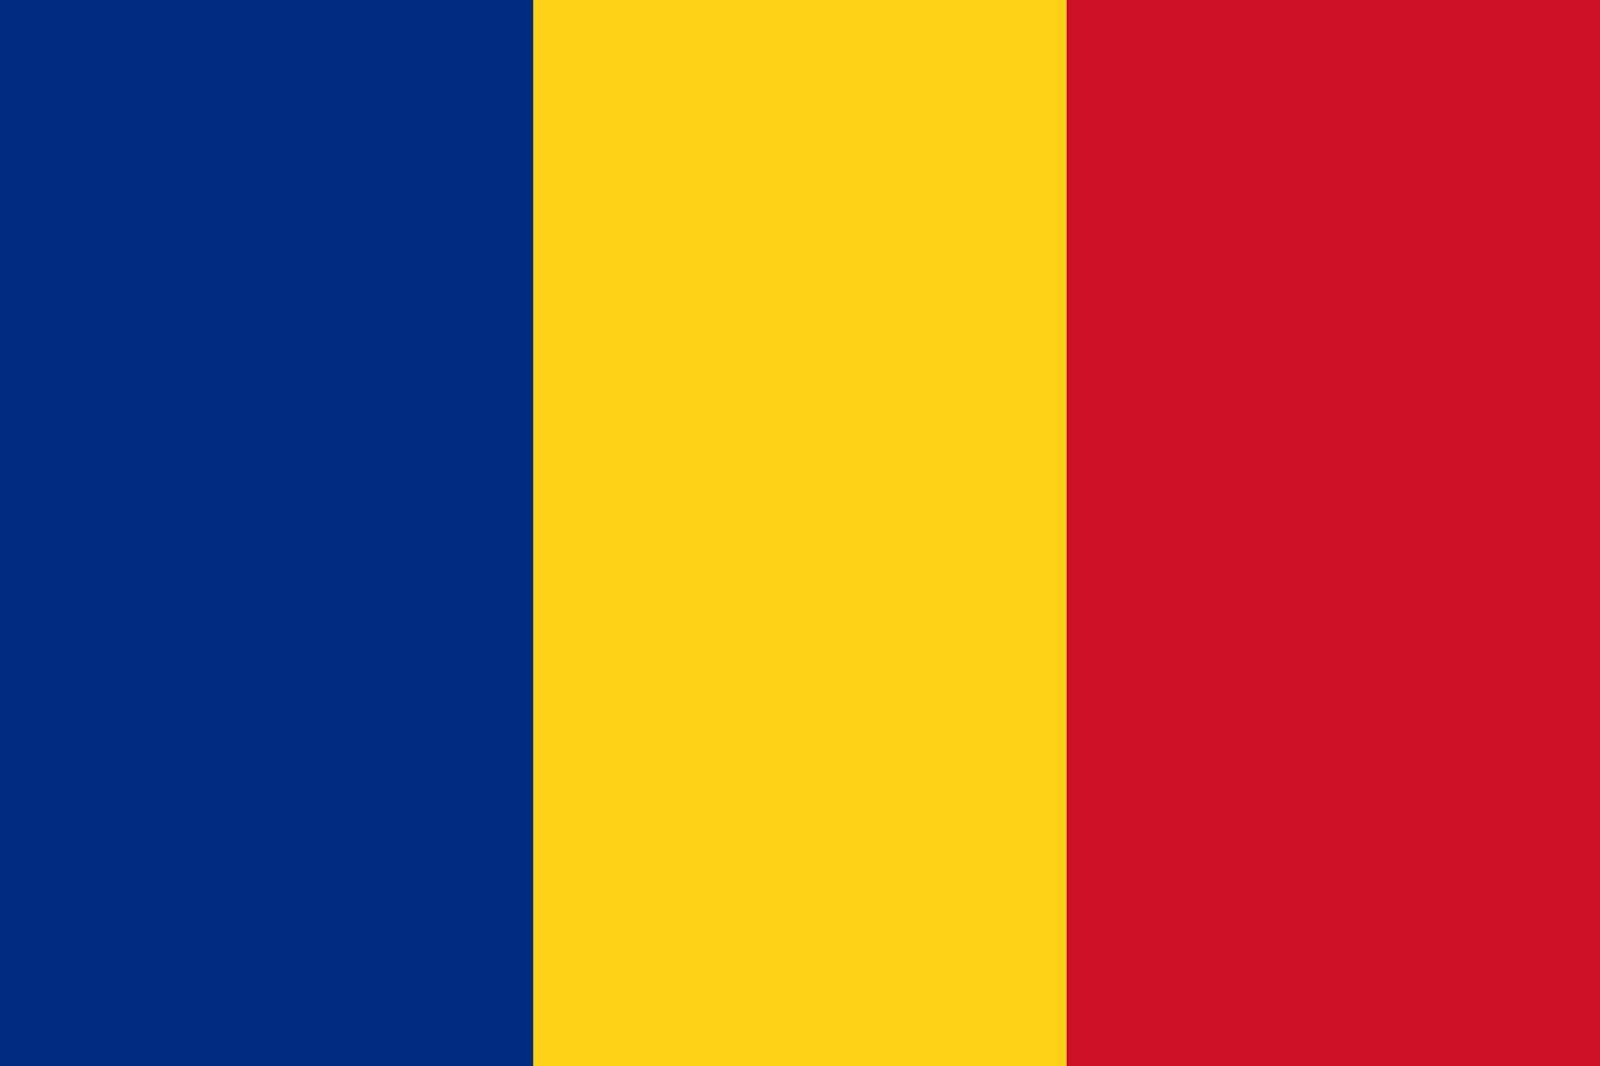 http://carbrandsincurrentproduction.blogspot.com.es/search/label/Romania